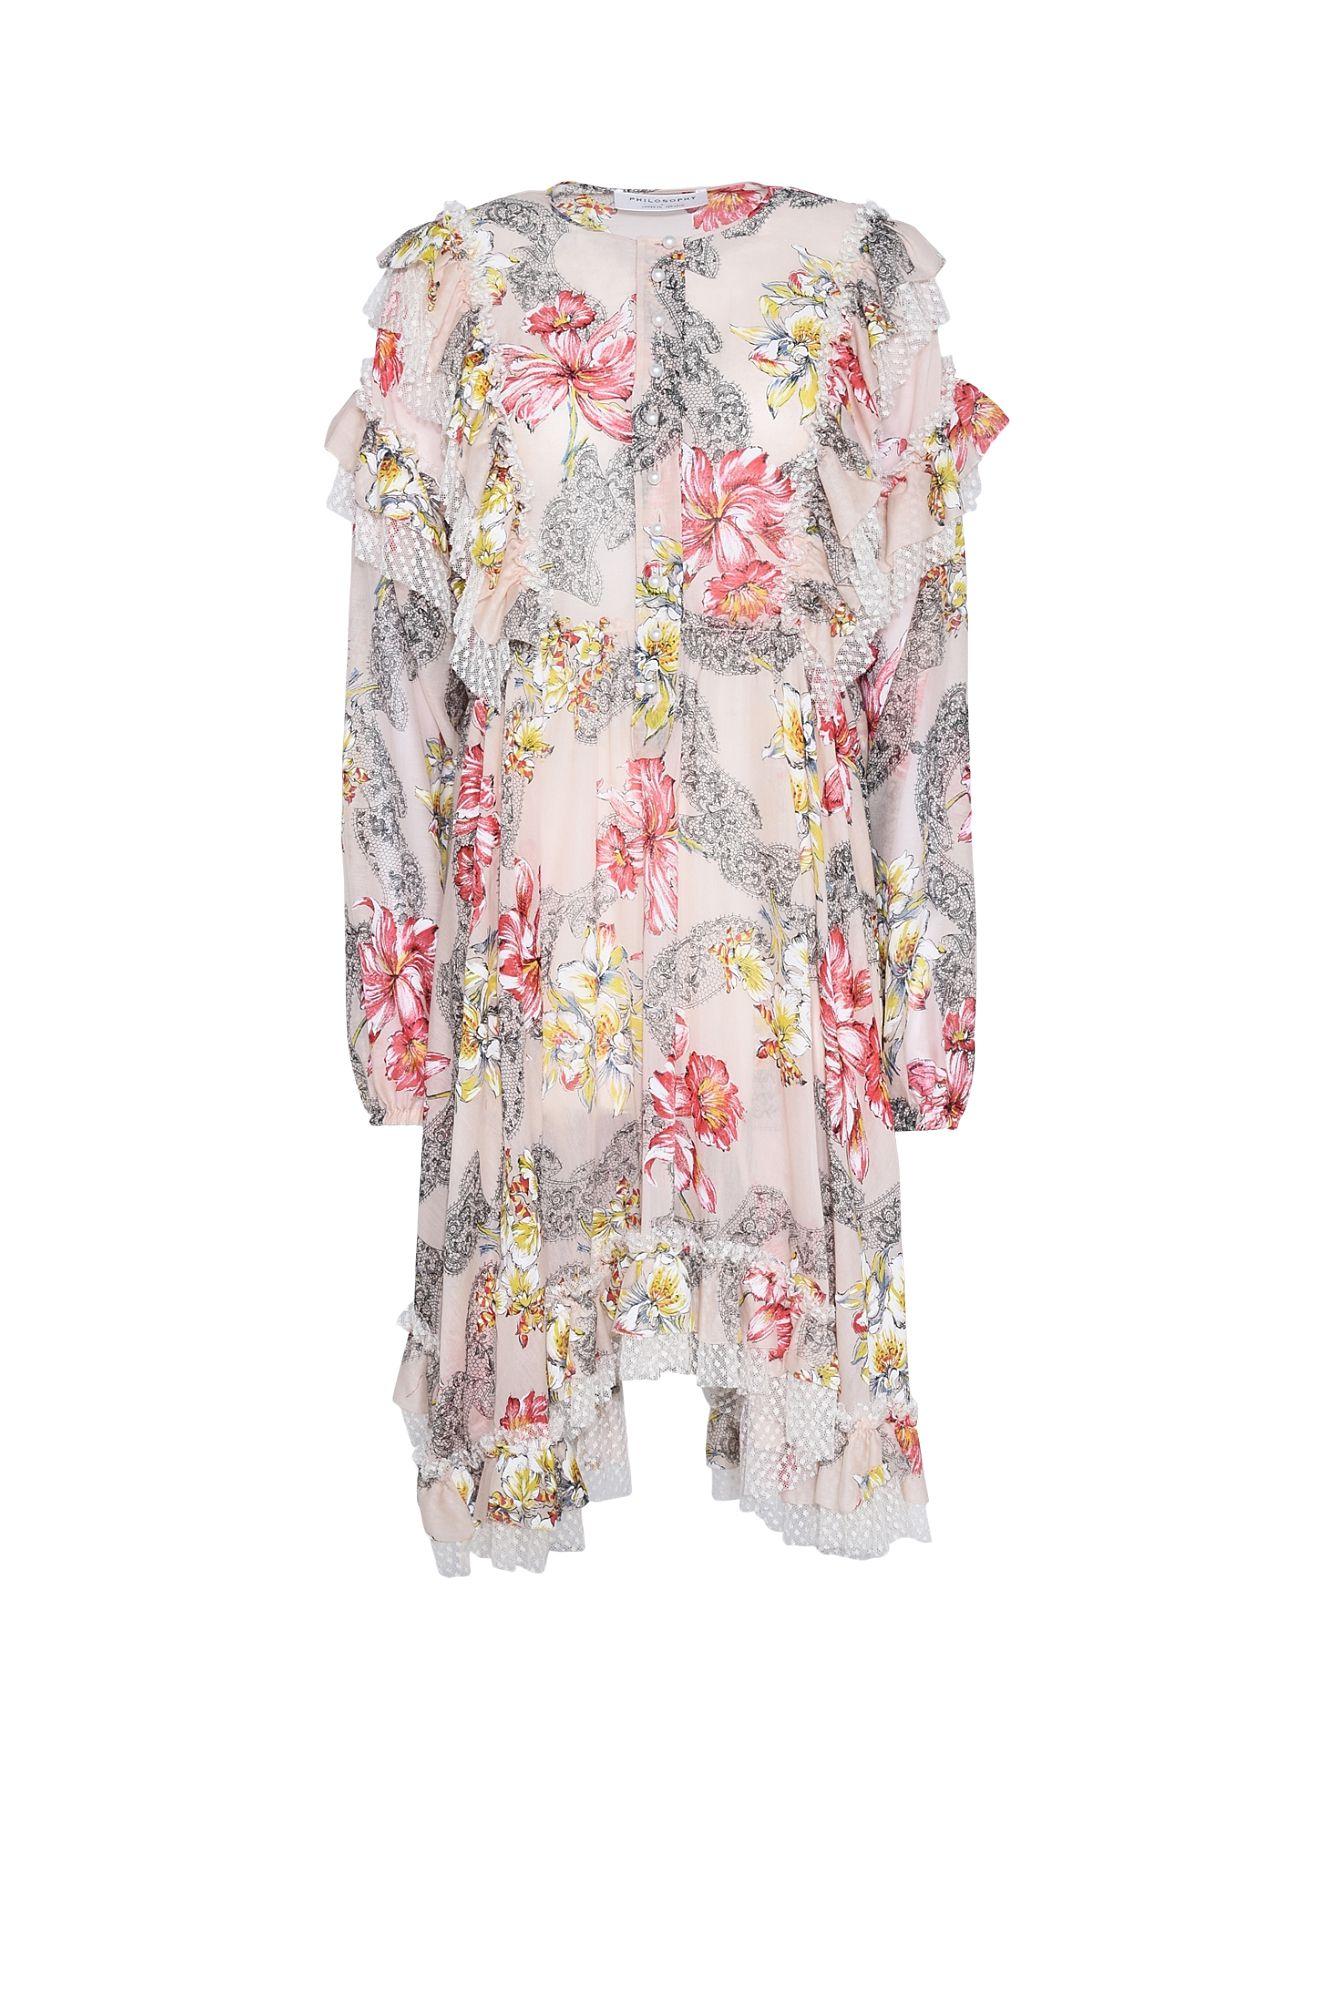 HIBISCUS SUMMER DRESS